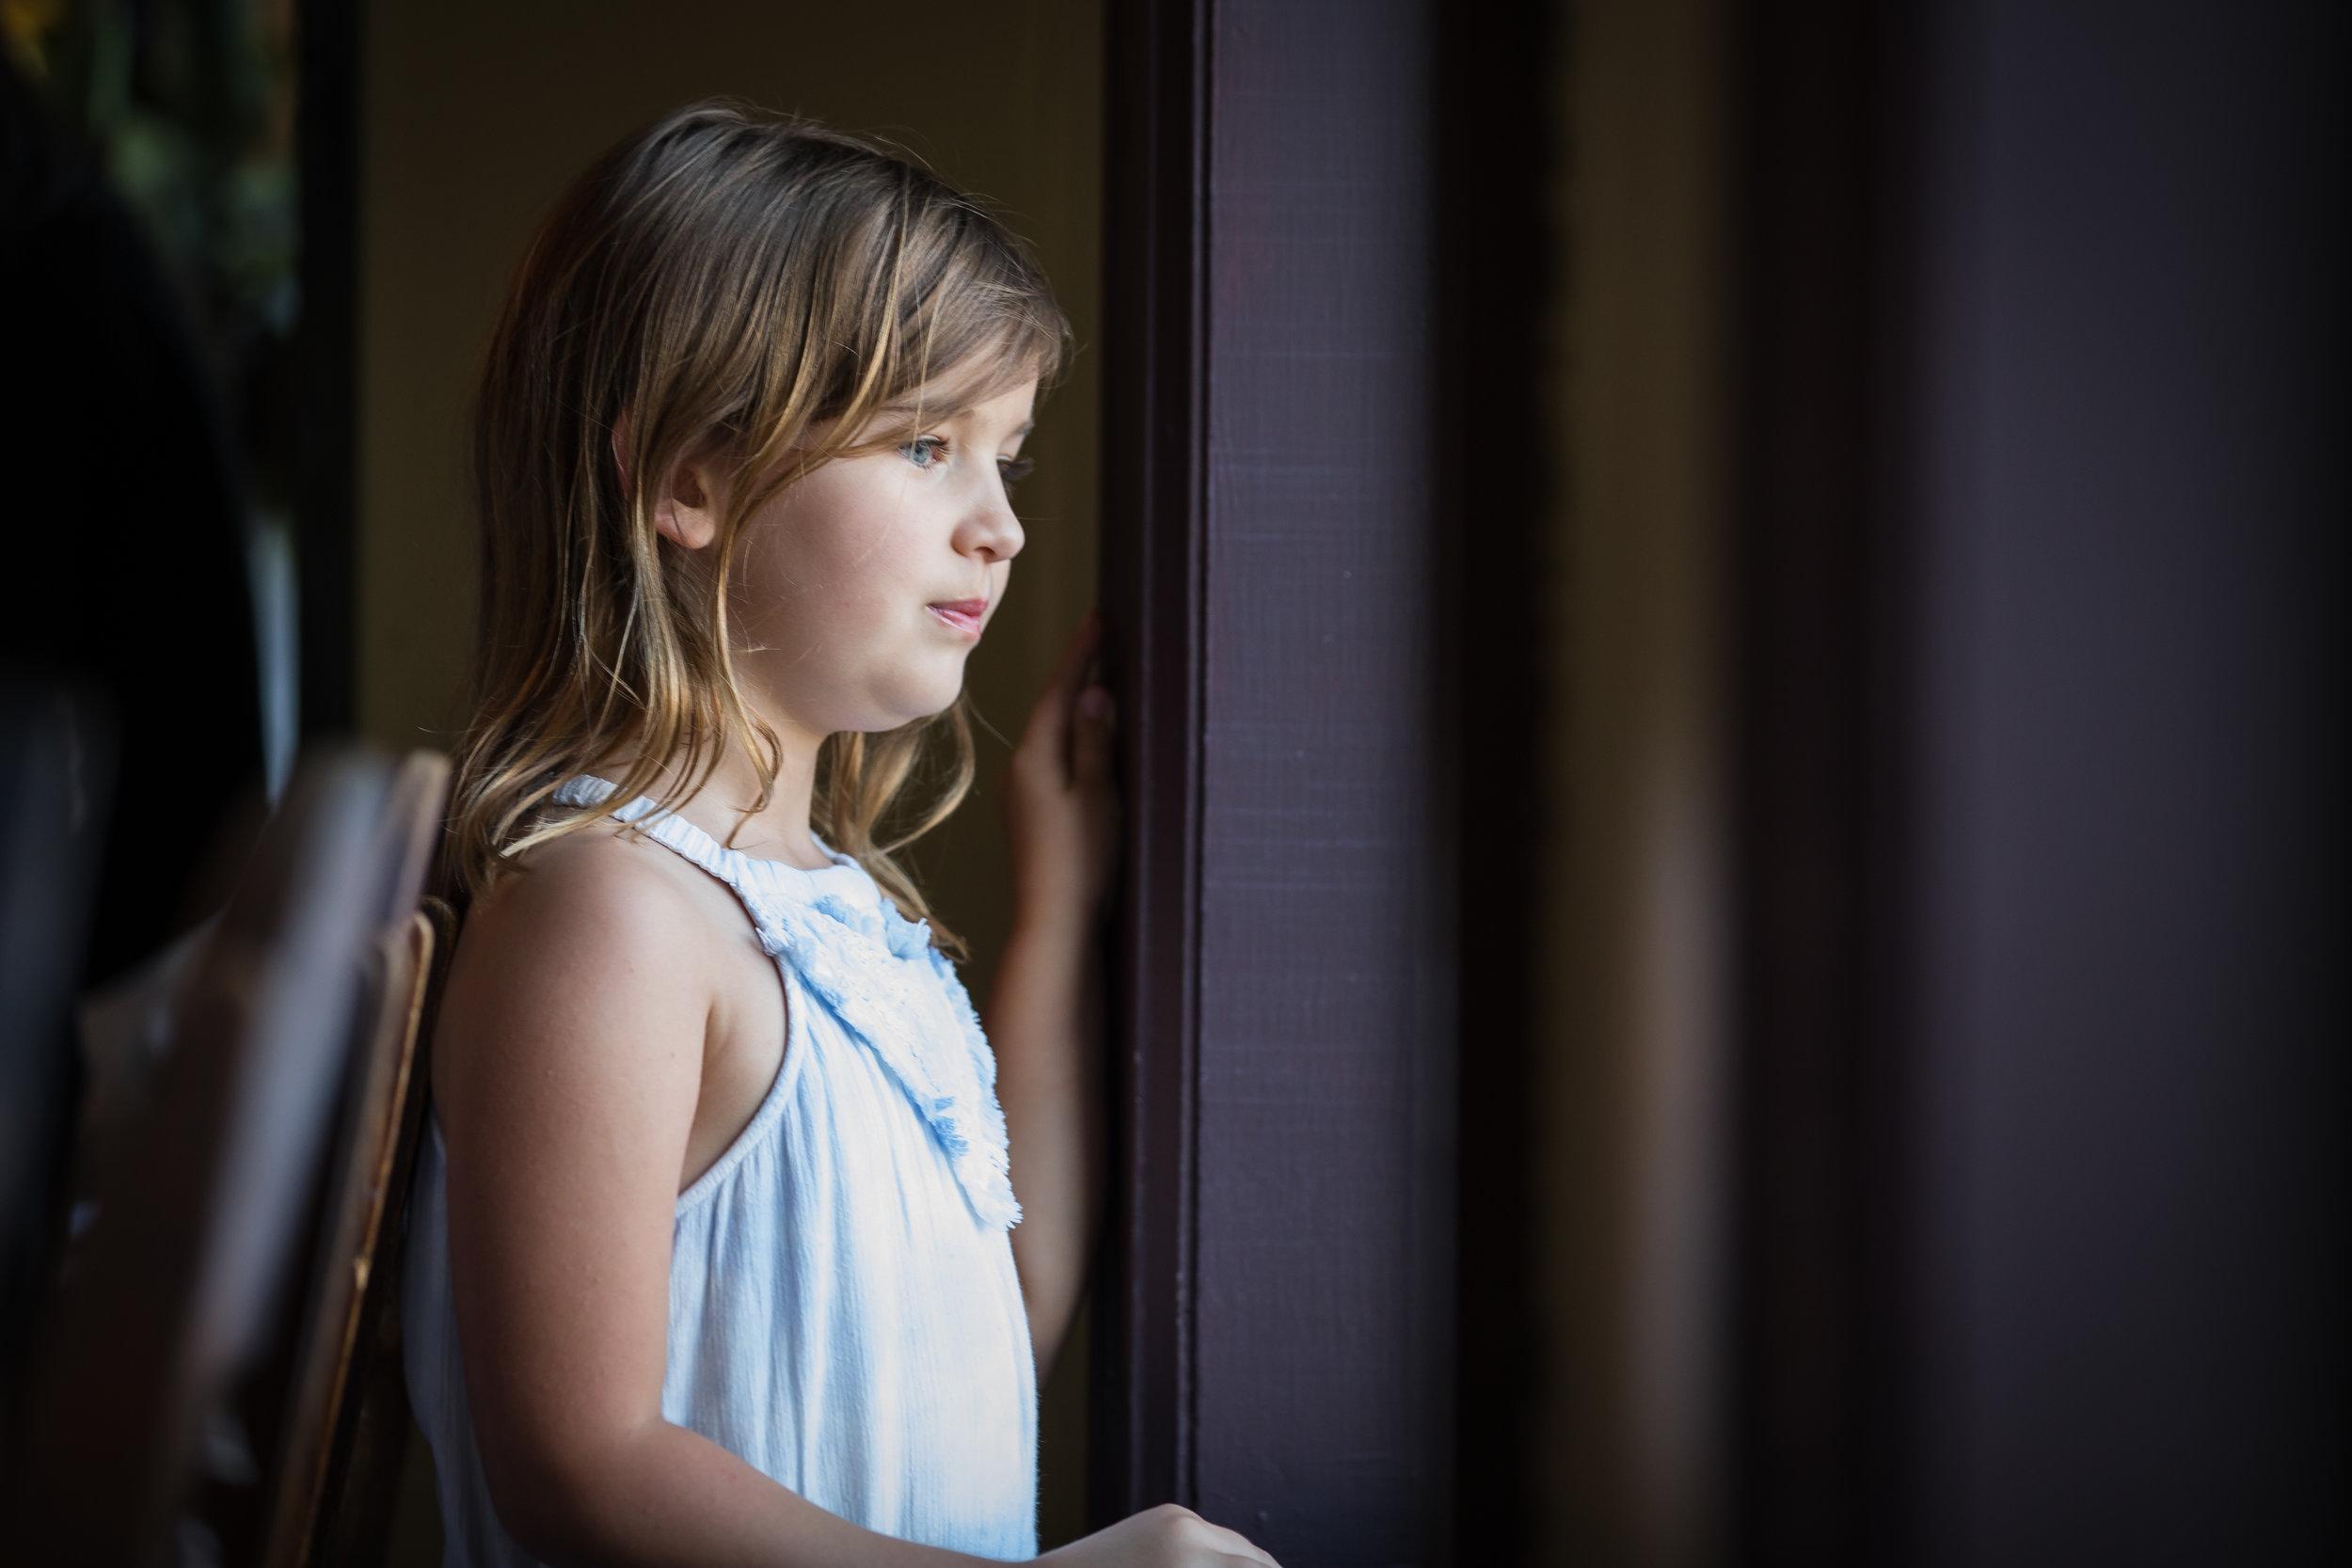 girl_window-2.jpg